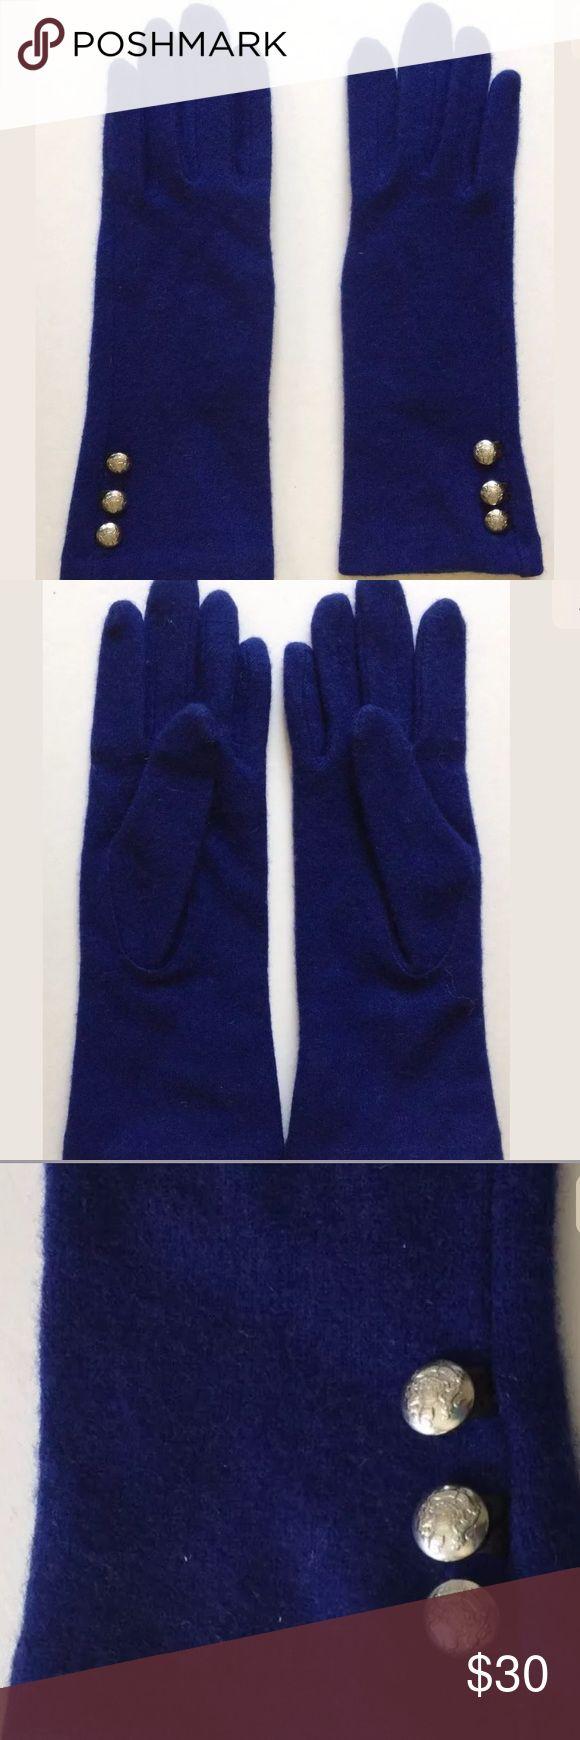 Ralph Lauren Gloves Blue Silver Buttons Size S Ralph Lauren Womens Gloves  Royal Blue  3 Silver Buttons at wrist Wool Cashmere Blend  Size S Ralph Lauren Accessories Gloves & Mittens